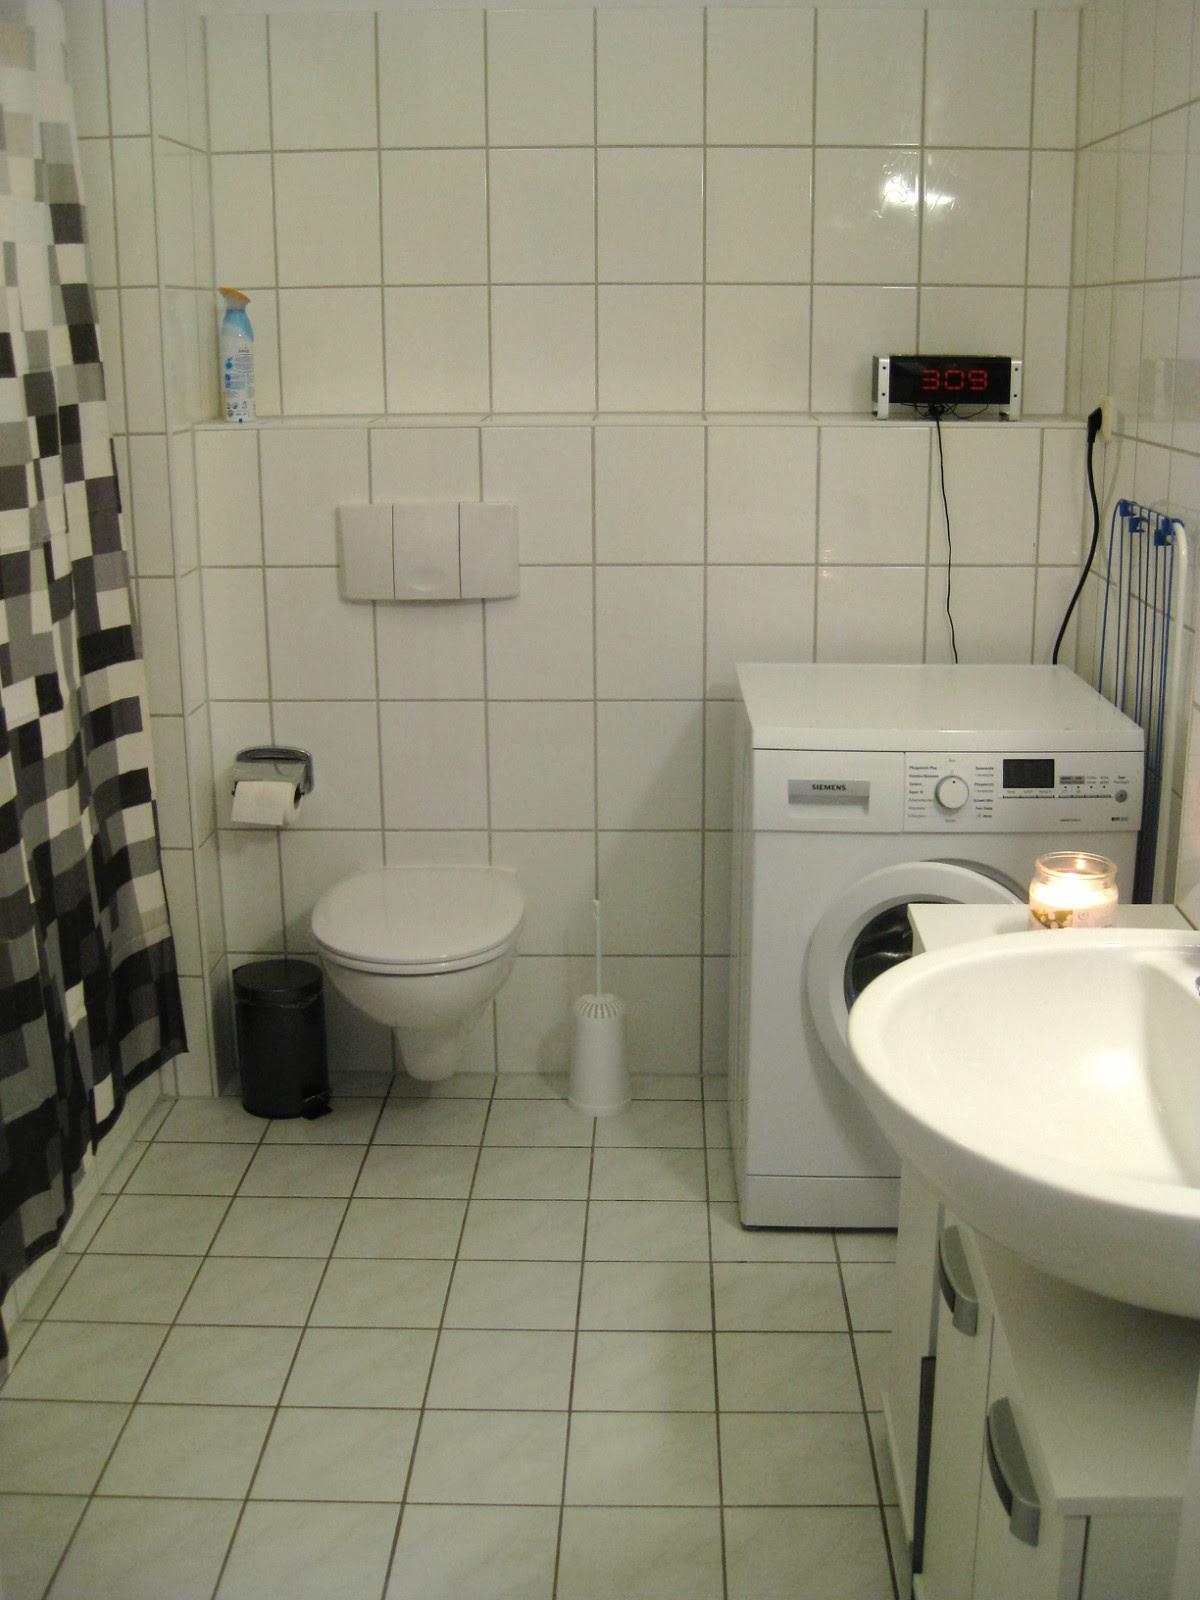 German Apartment Tour: Bathroom - Welcome to Germerica